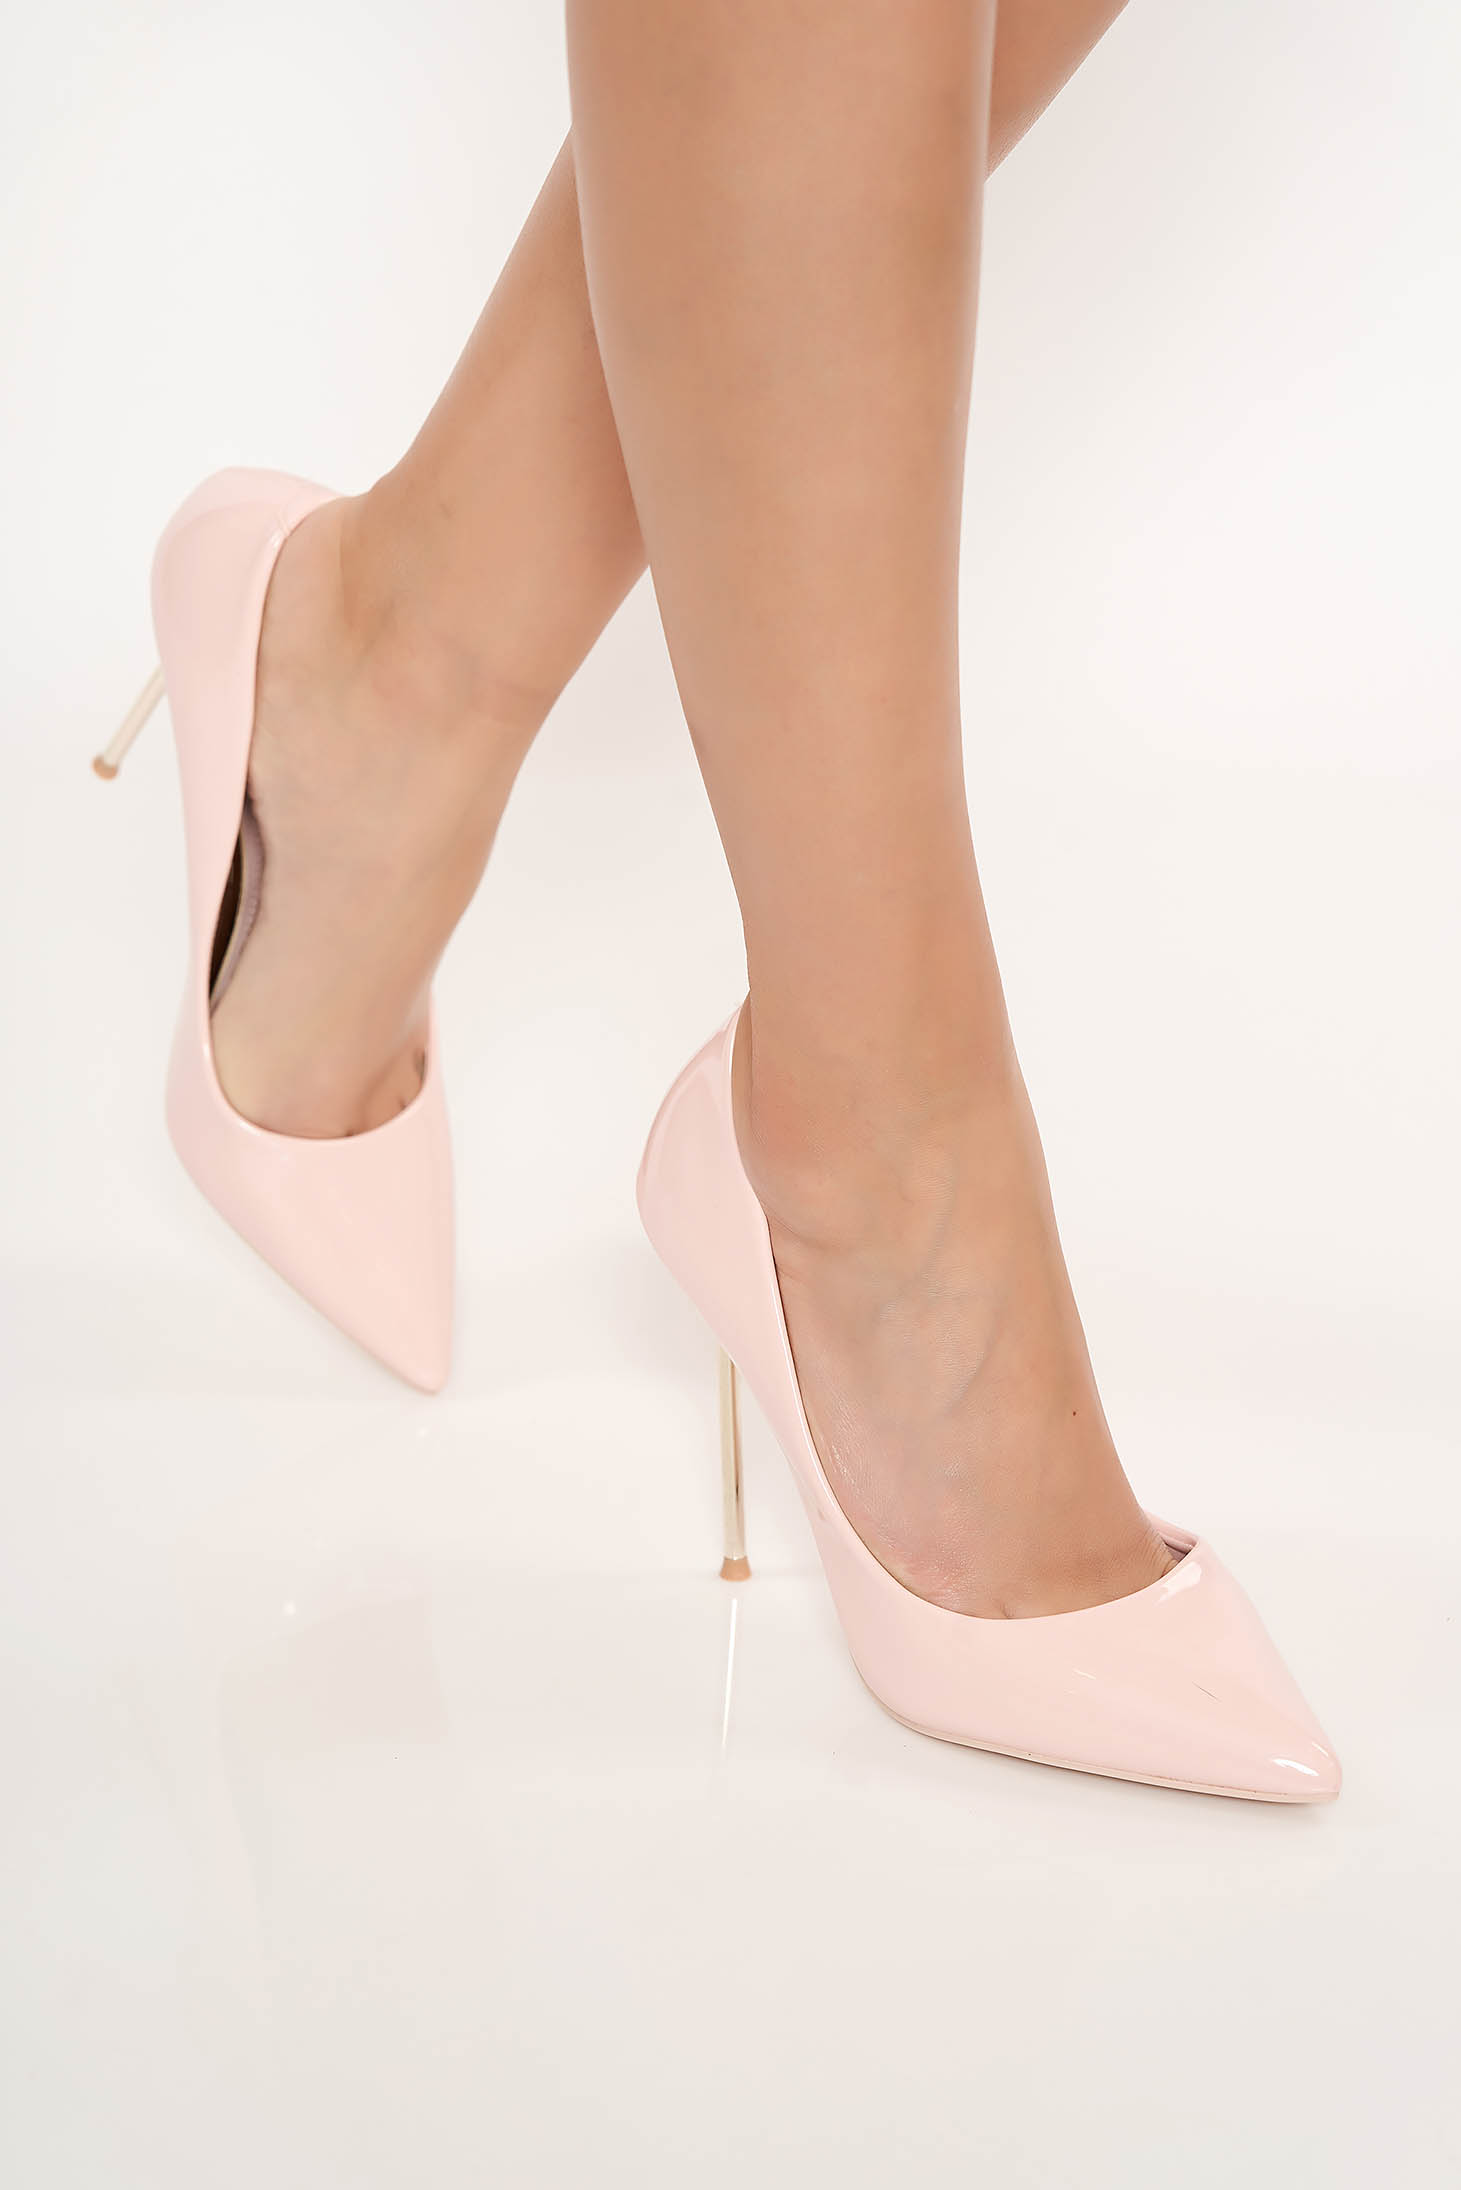 Lightpink elegant shoes from ecological varnished leather slightly pointed toe tip with high heels